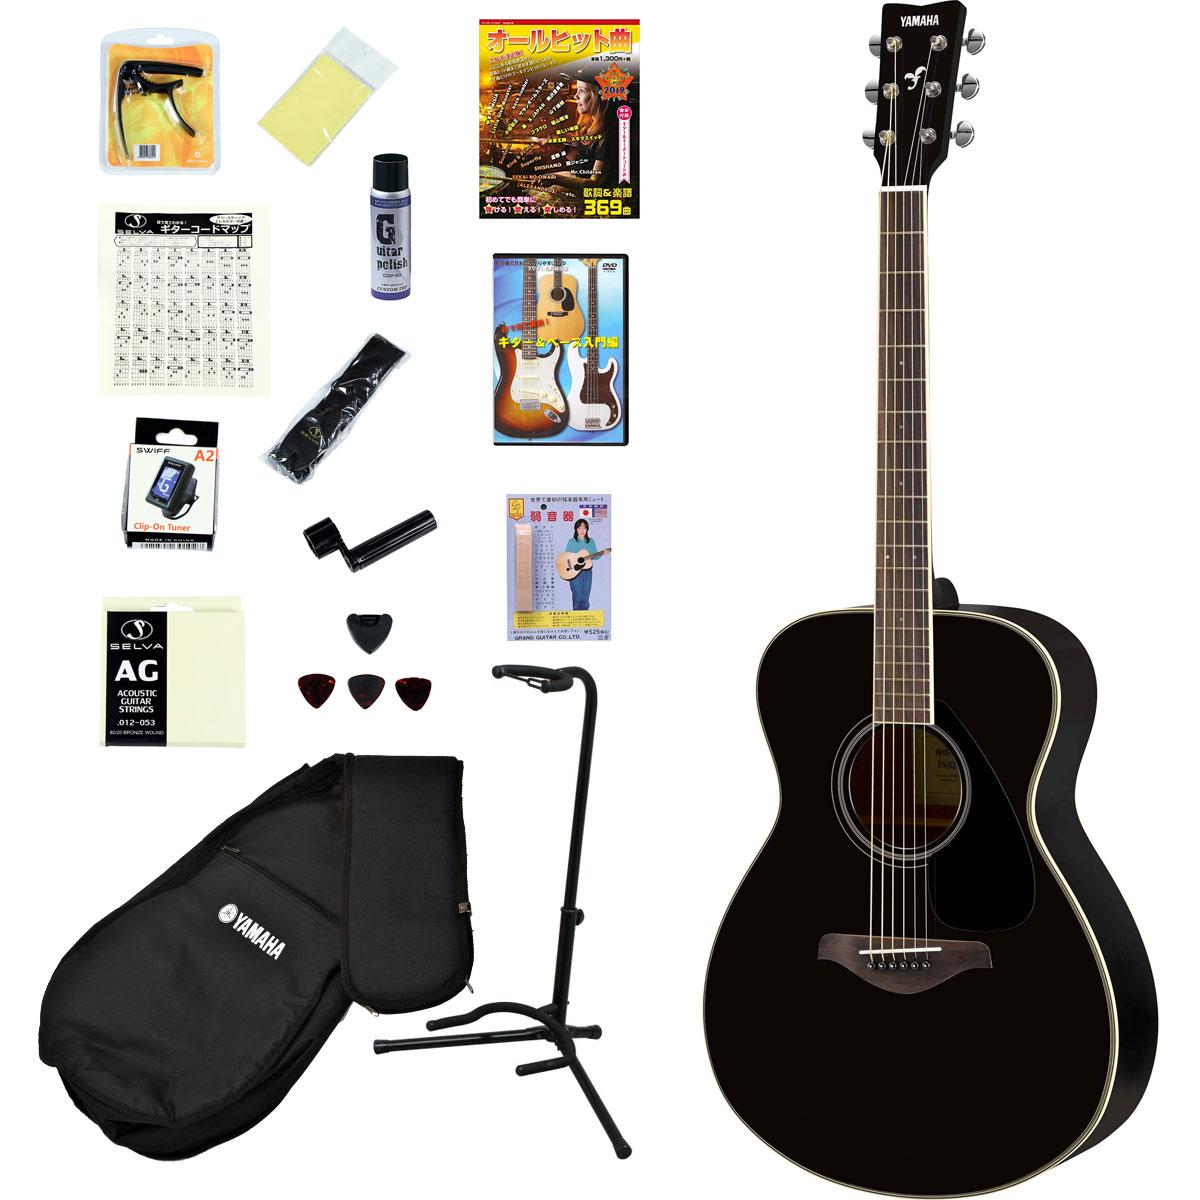 YAMAHA / FS820 BL(ブラック) 【オールヒット曲歌本17点入門セット】【楽譜が付いたお買い得セット】 ヤマハ アコースティックギター アコギ FS-820 入門 初心者【YRK】